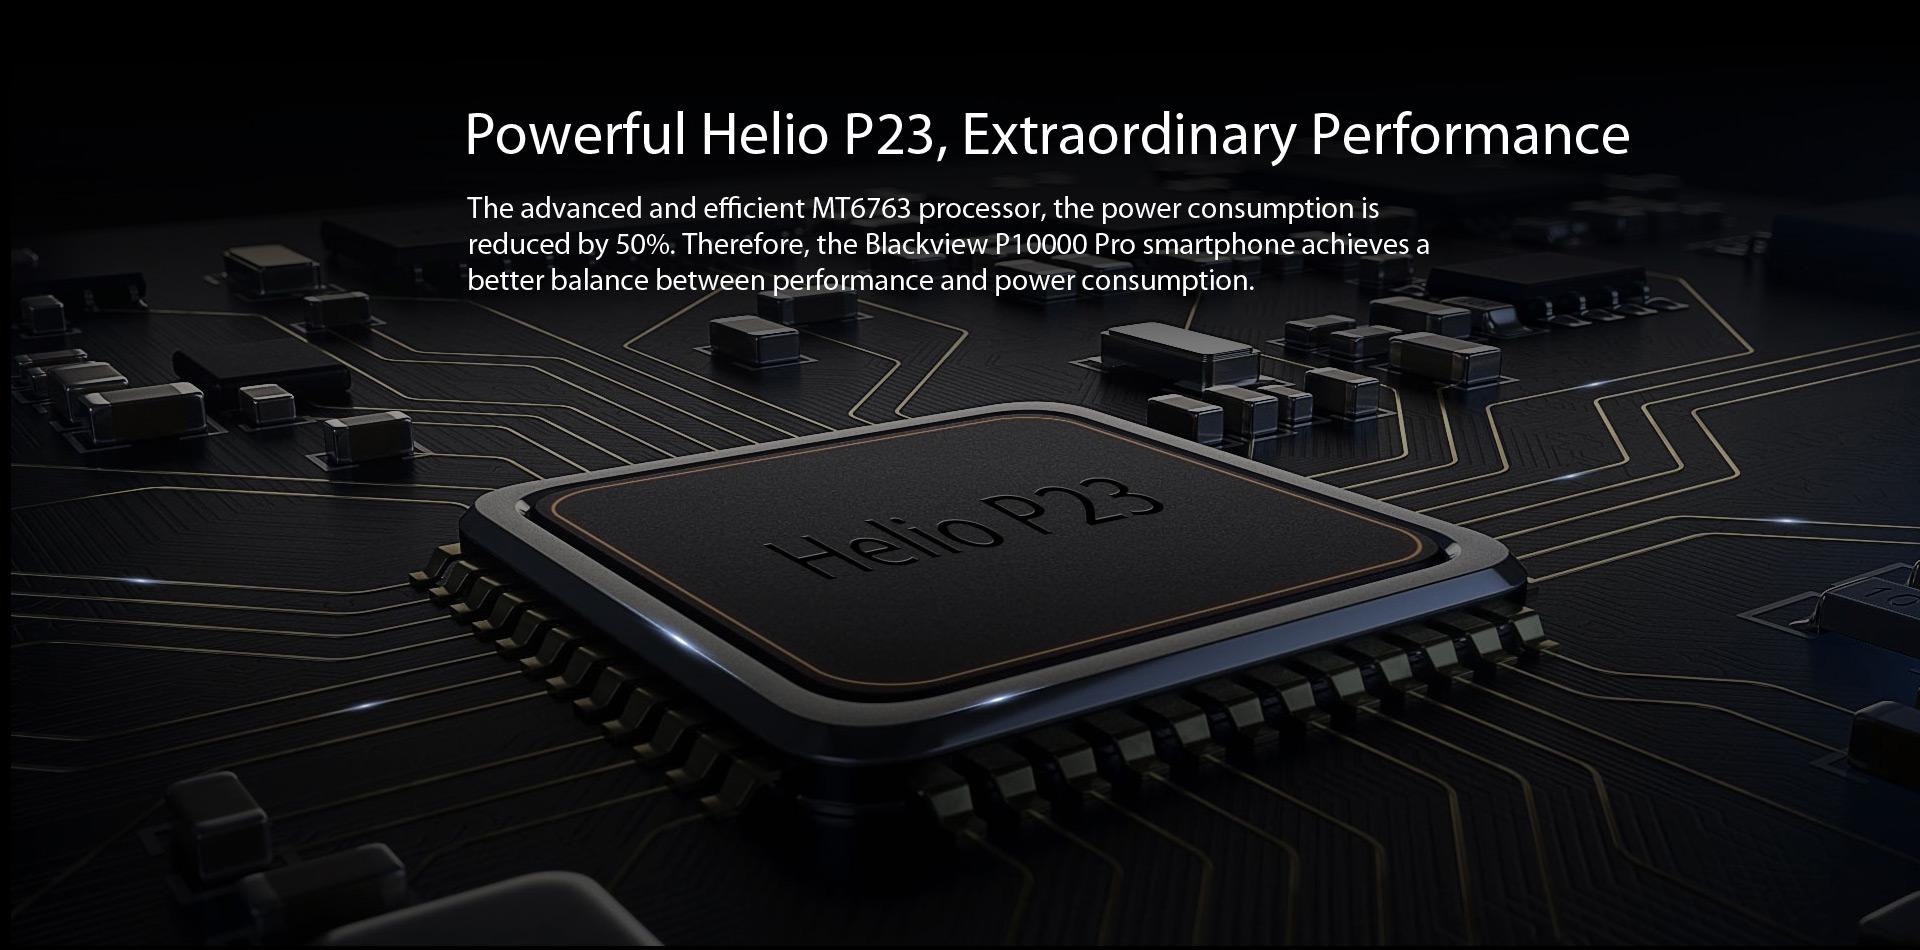 Blackview P10000 Pro - Hardware